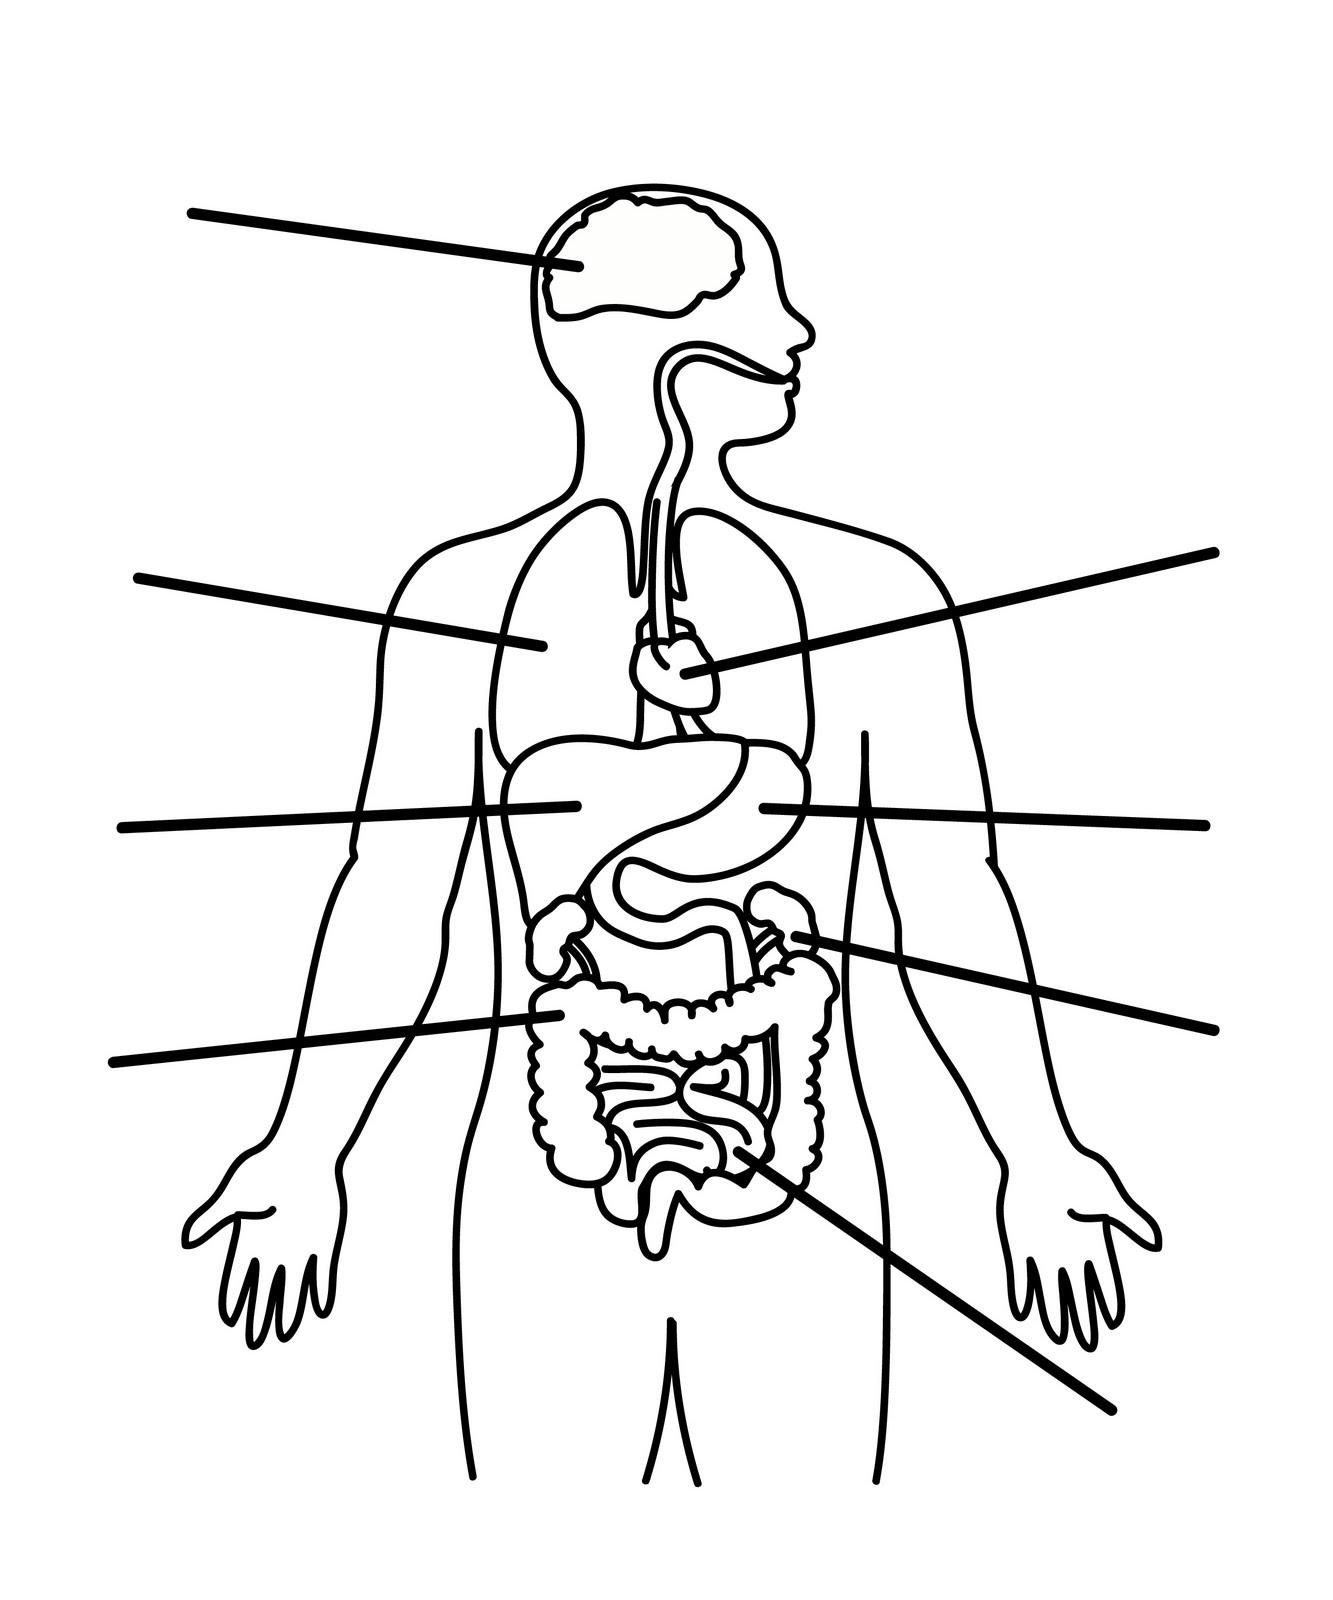 1333x1600 Human Body Anatomy Outline Printable For Kids Montessori Science